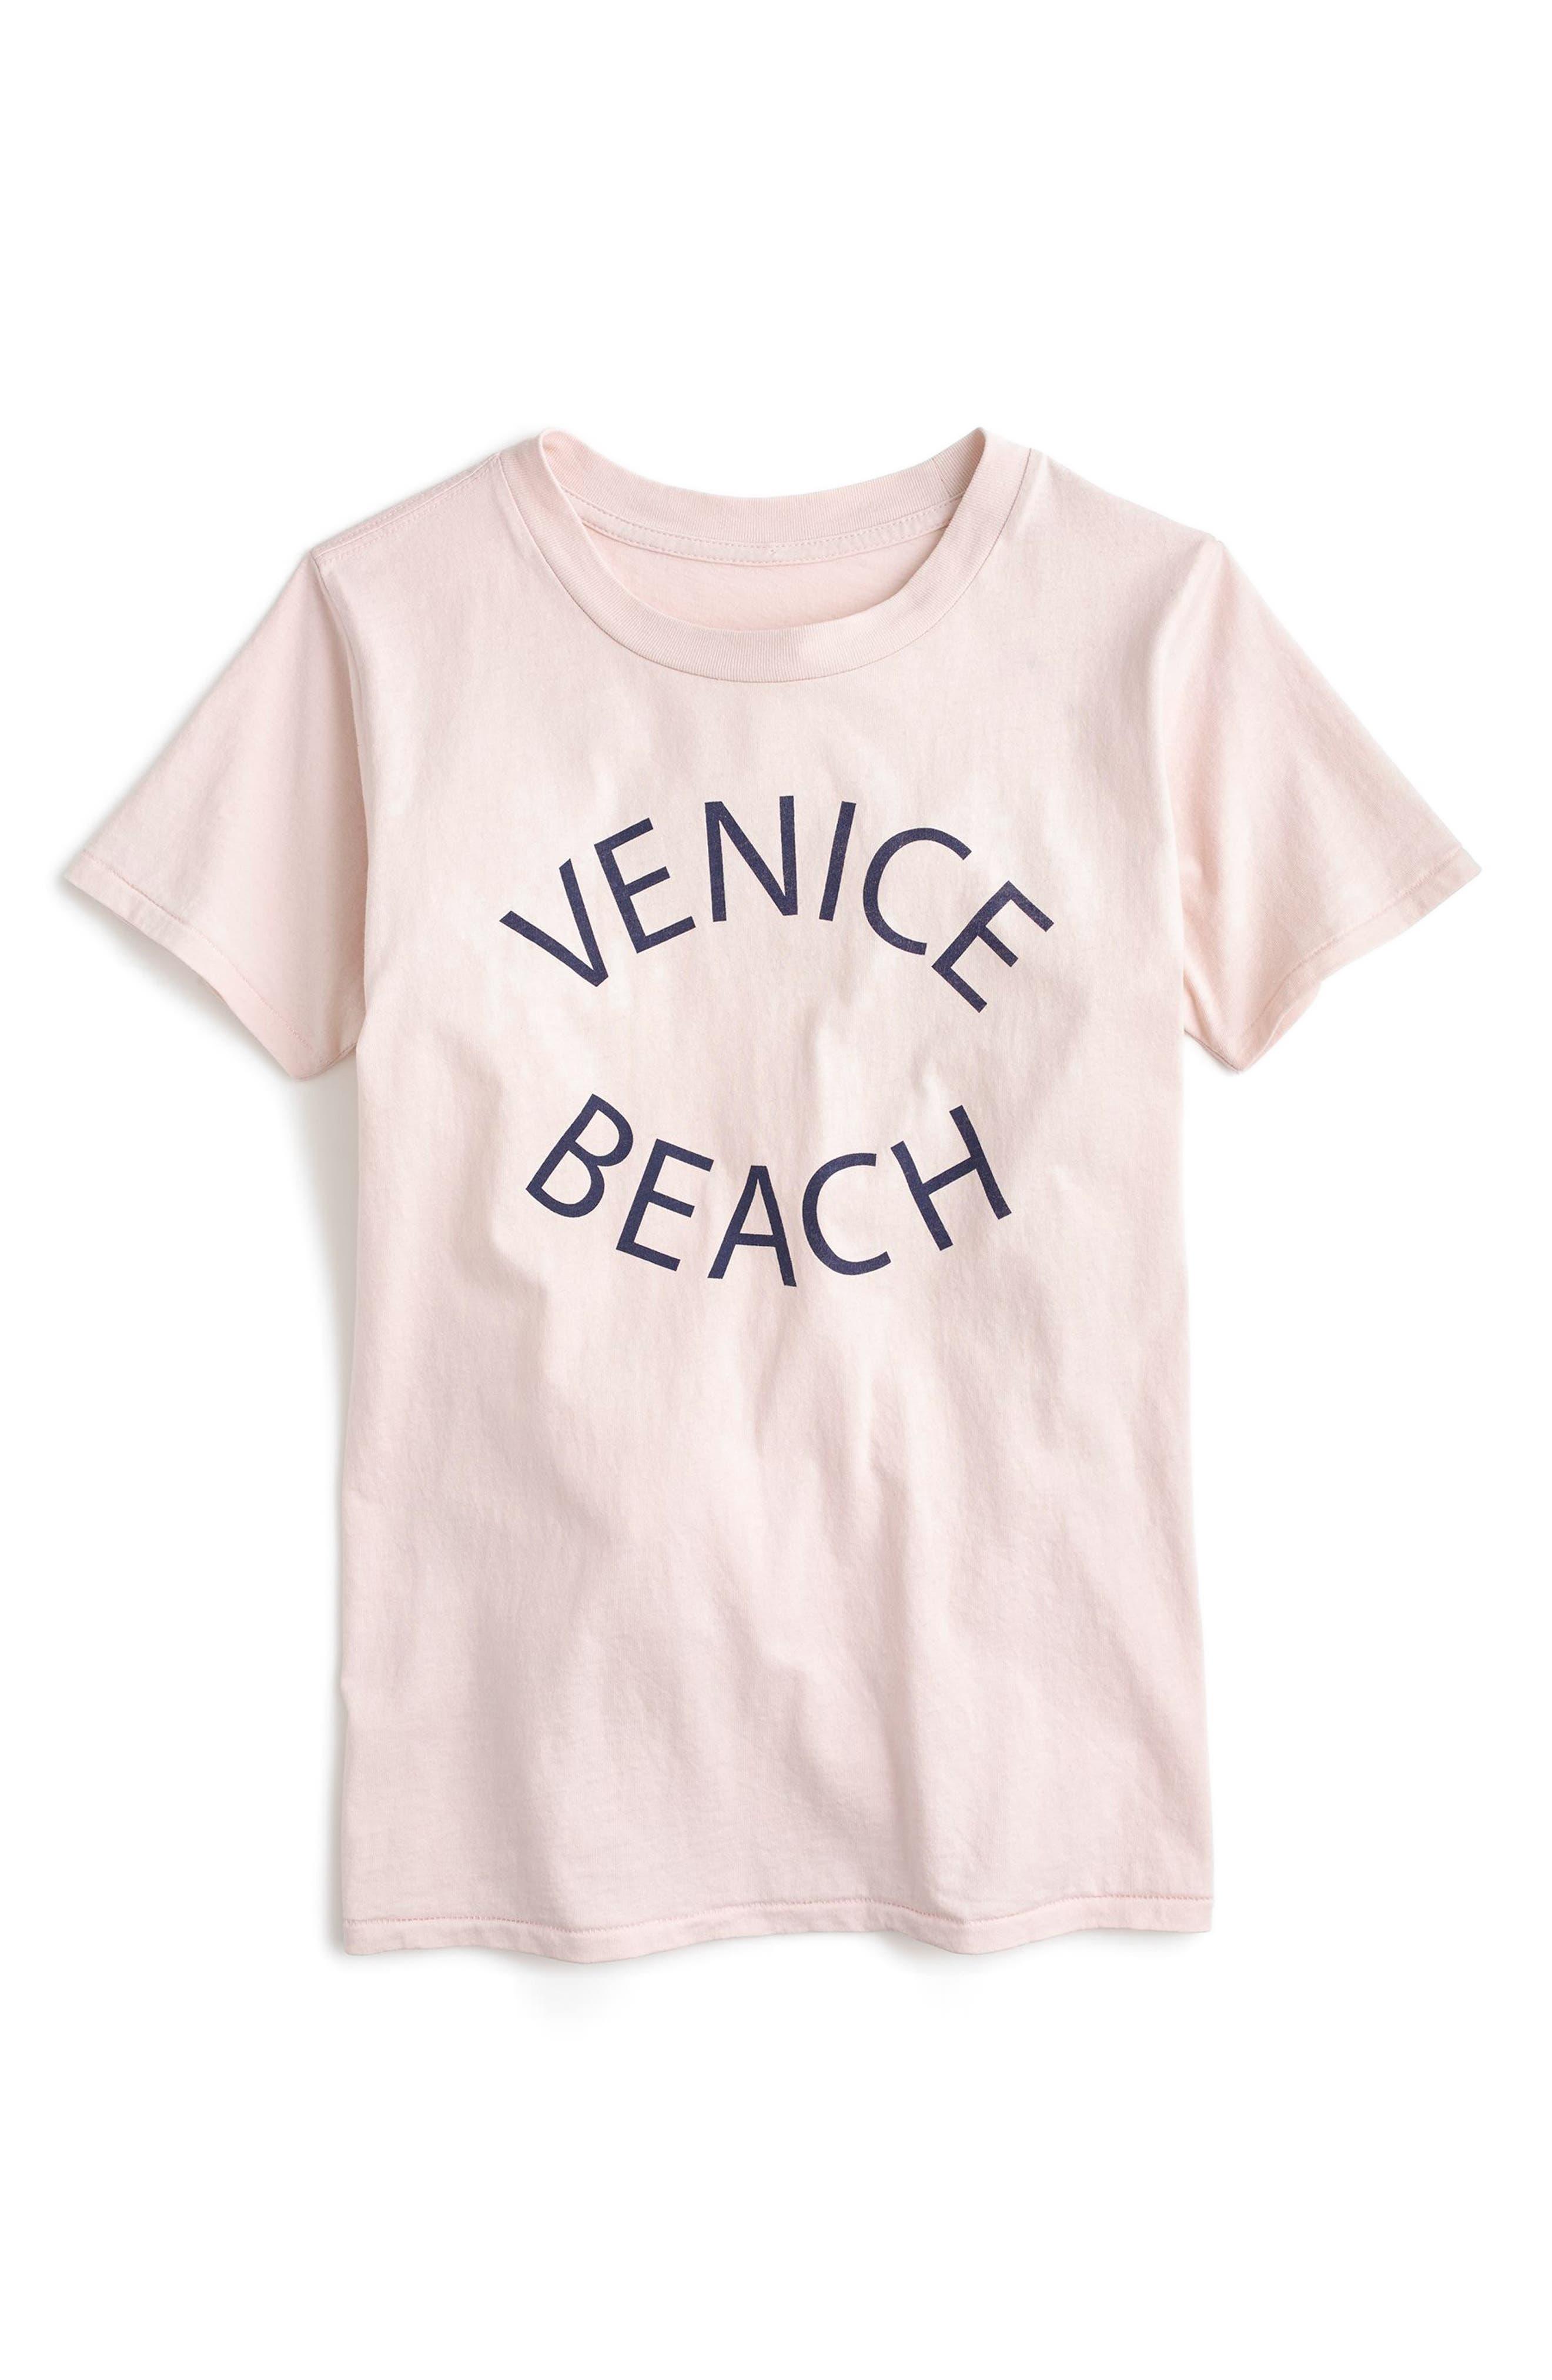 Venice Beach Graphic Tee,                             Main thumbnail 1, color,                             650